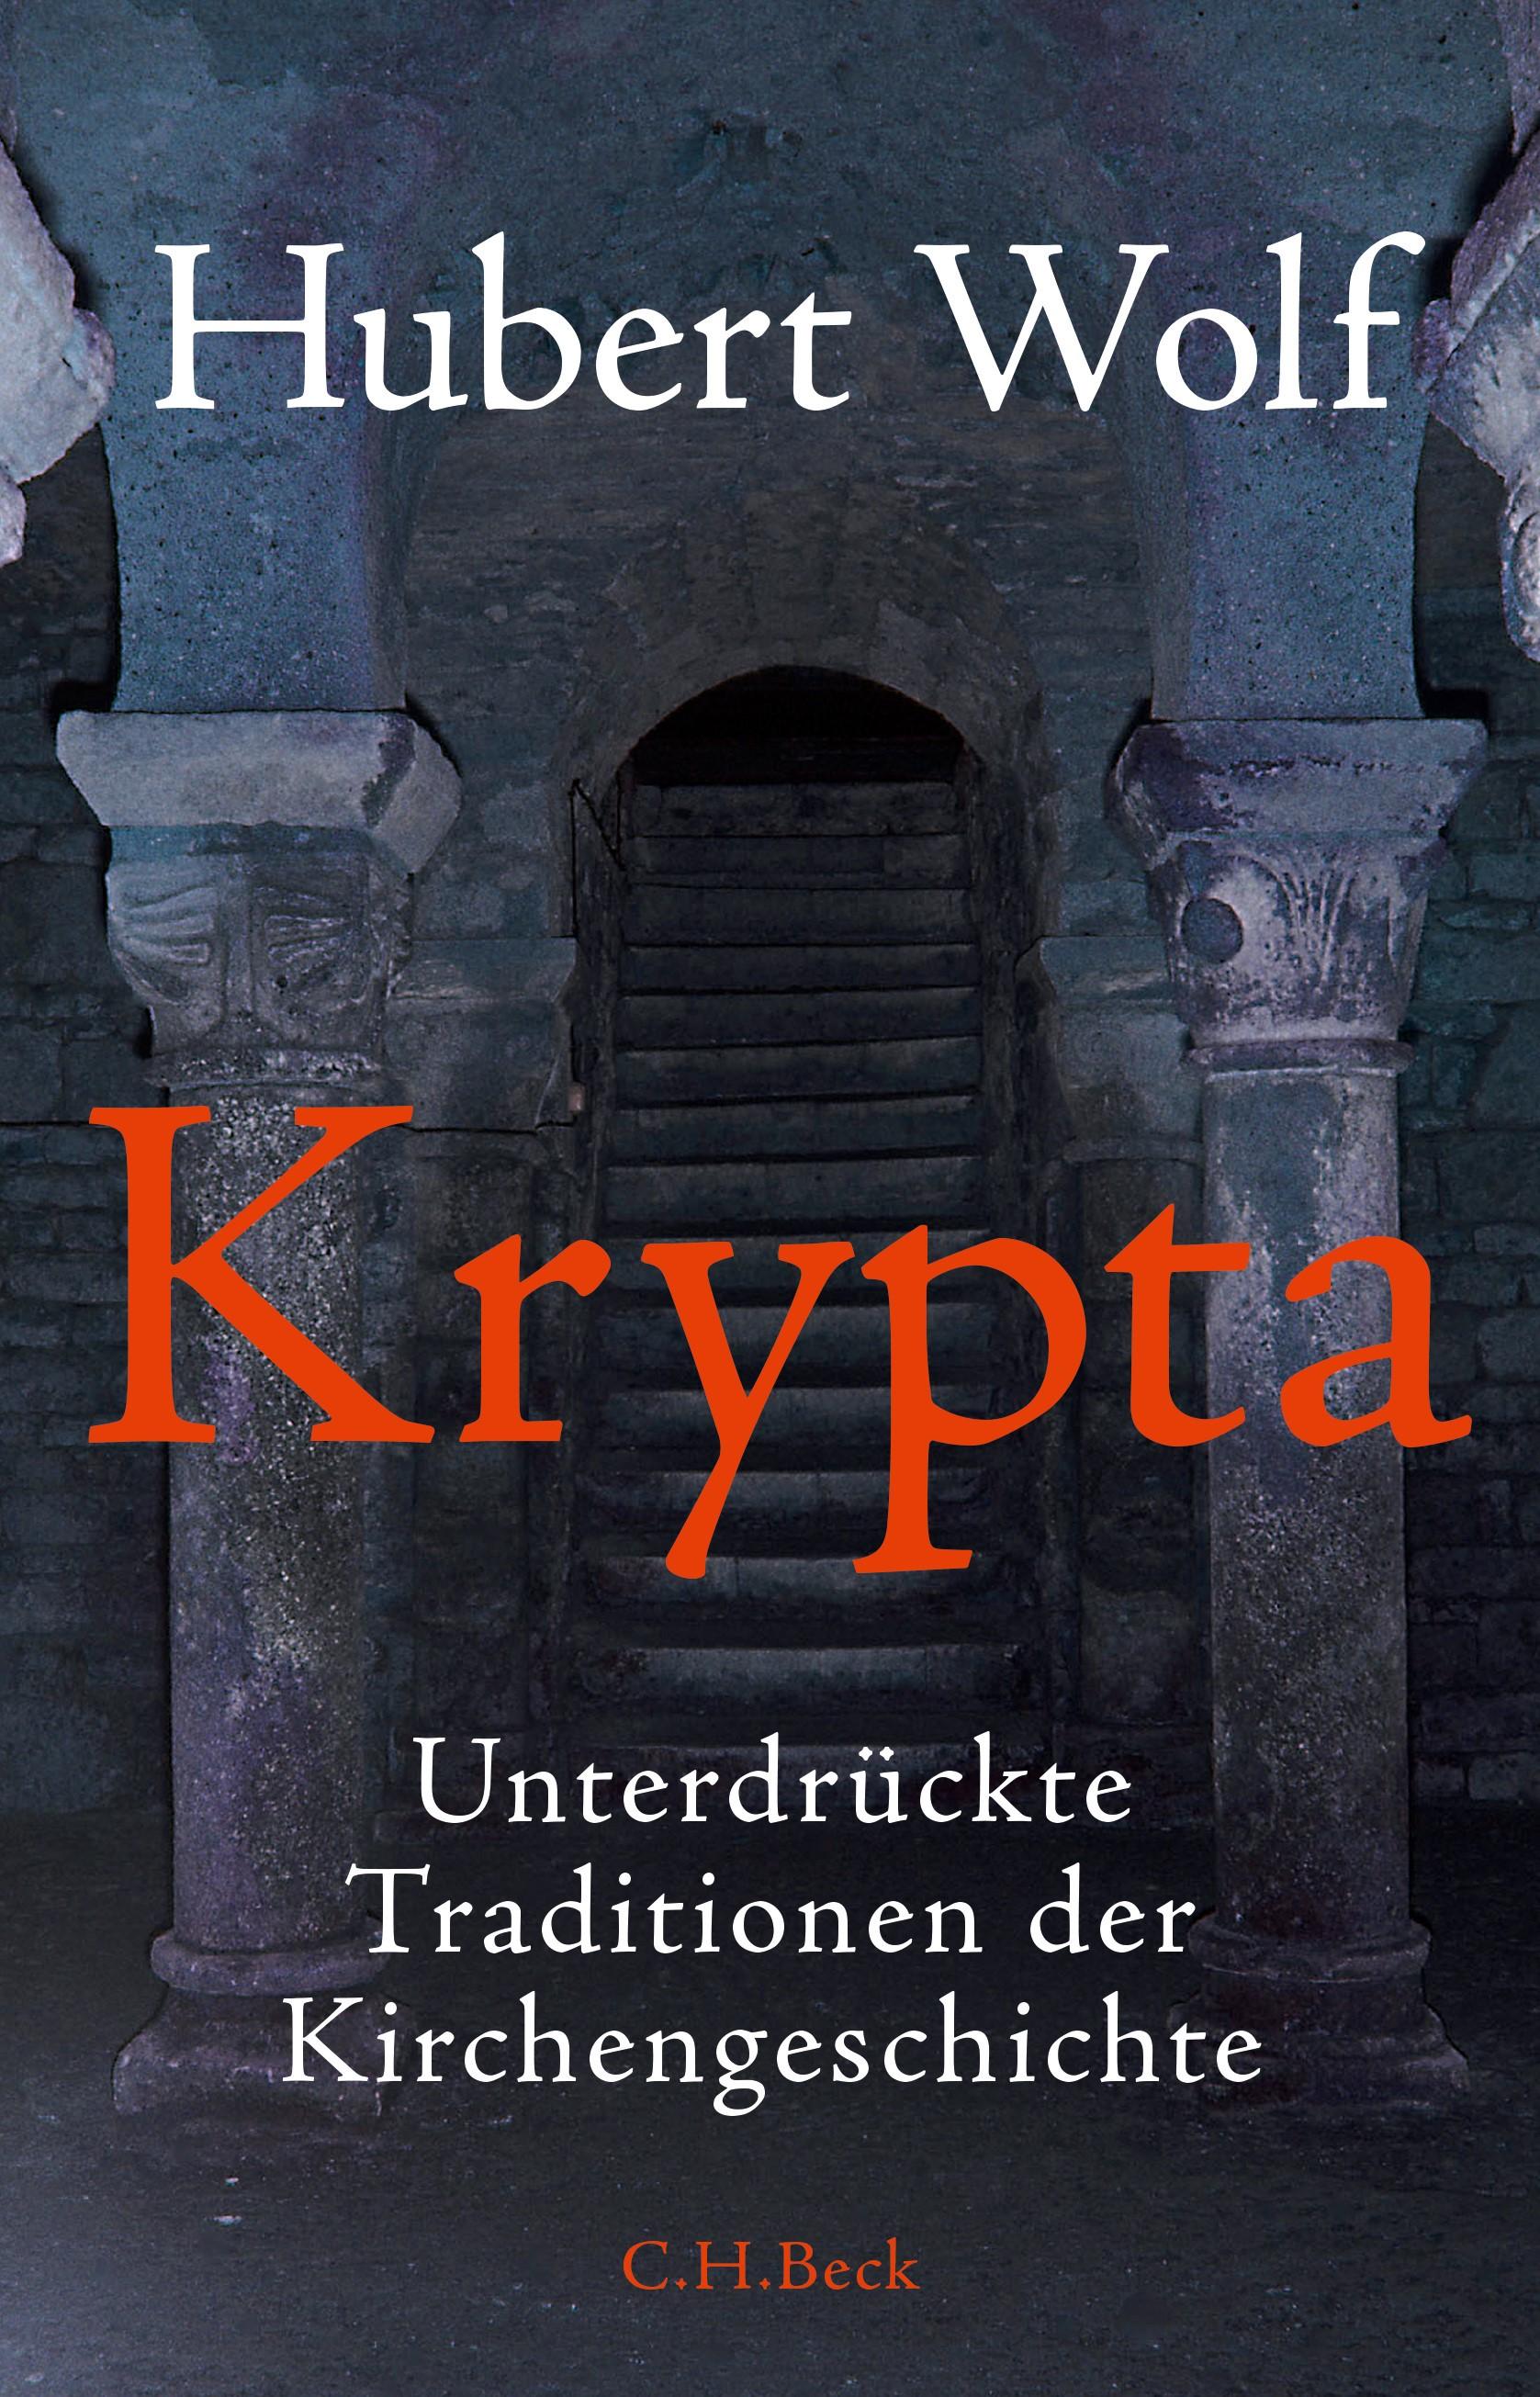 Cover des Buches 'Krypta'